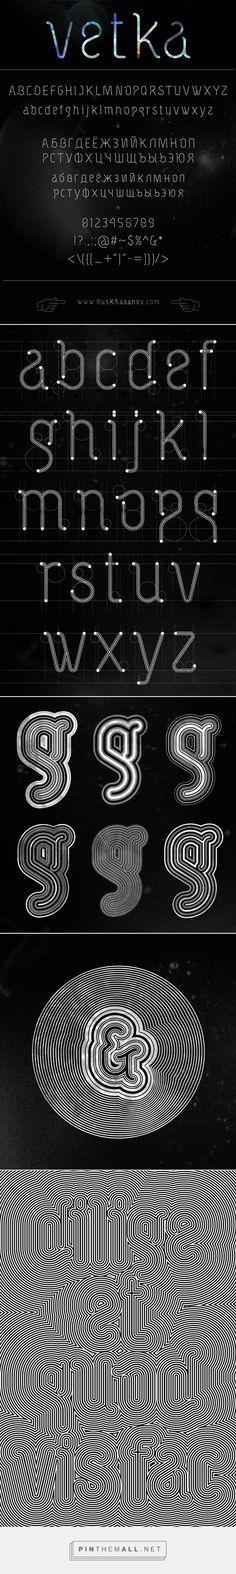 Vetka Font  -  Rus Khasanov Graphic Design Projects, Fonts, Pictures, Image, Designer Fonts, Photos, Types Of Font Styles, Script Fonts, Wedding Fonts